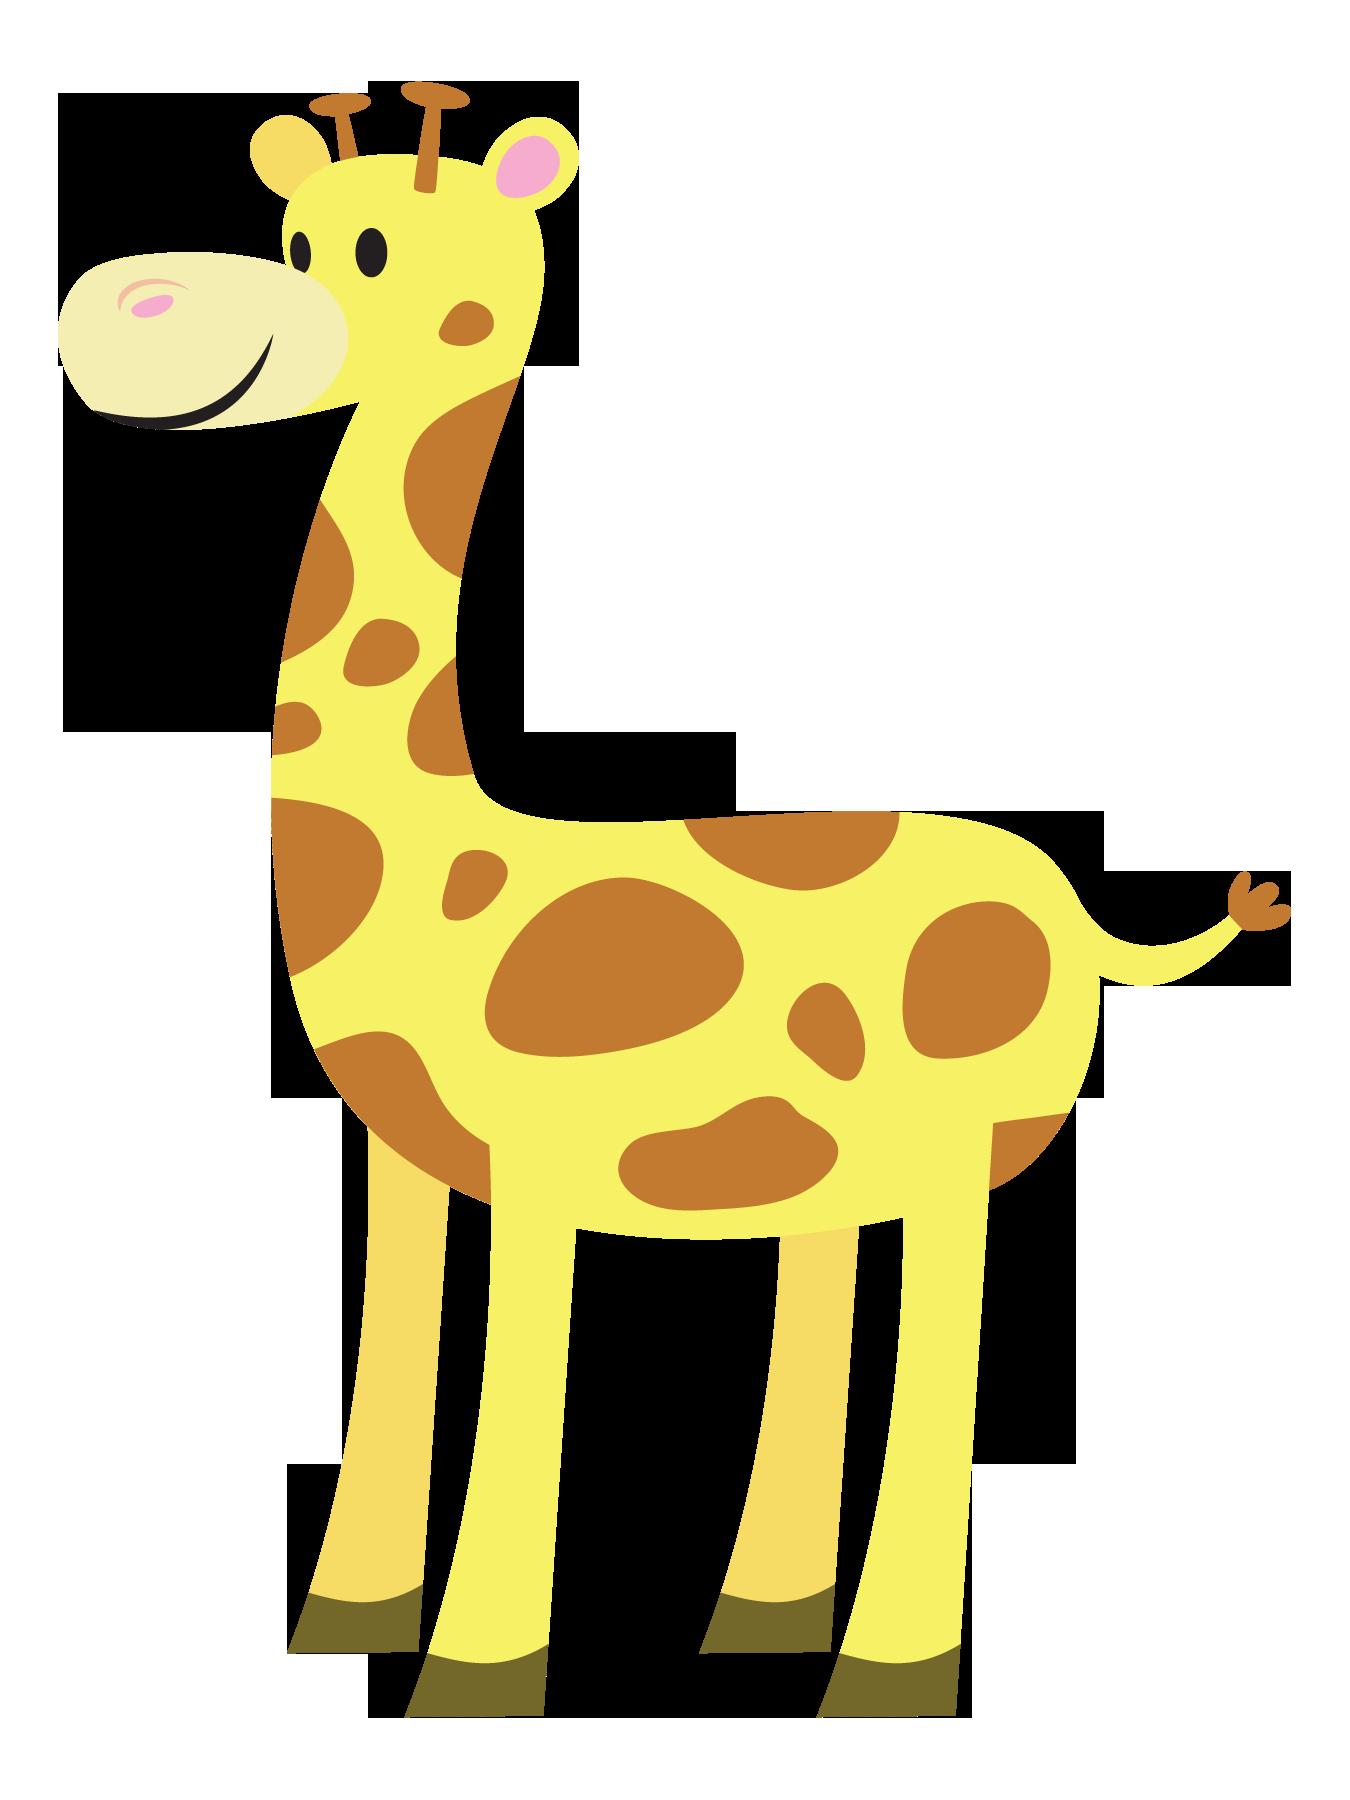 Giraffe image clipart jpg Free Giraffe Cliparts, Download Free Clip Art, Free Clip Art on ... jpg